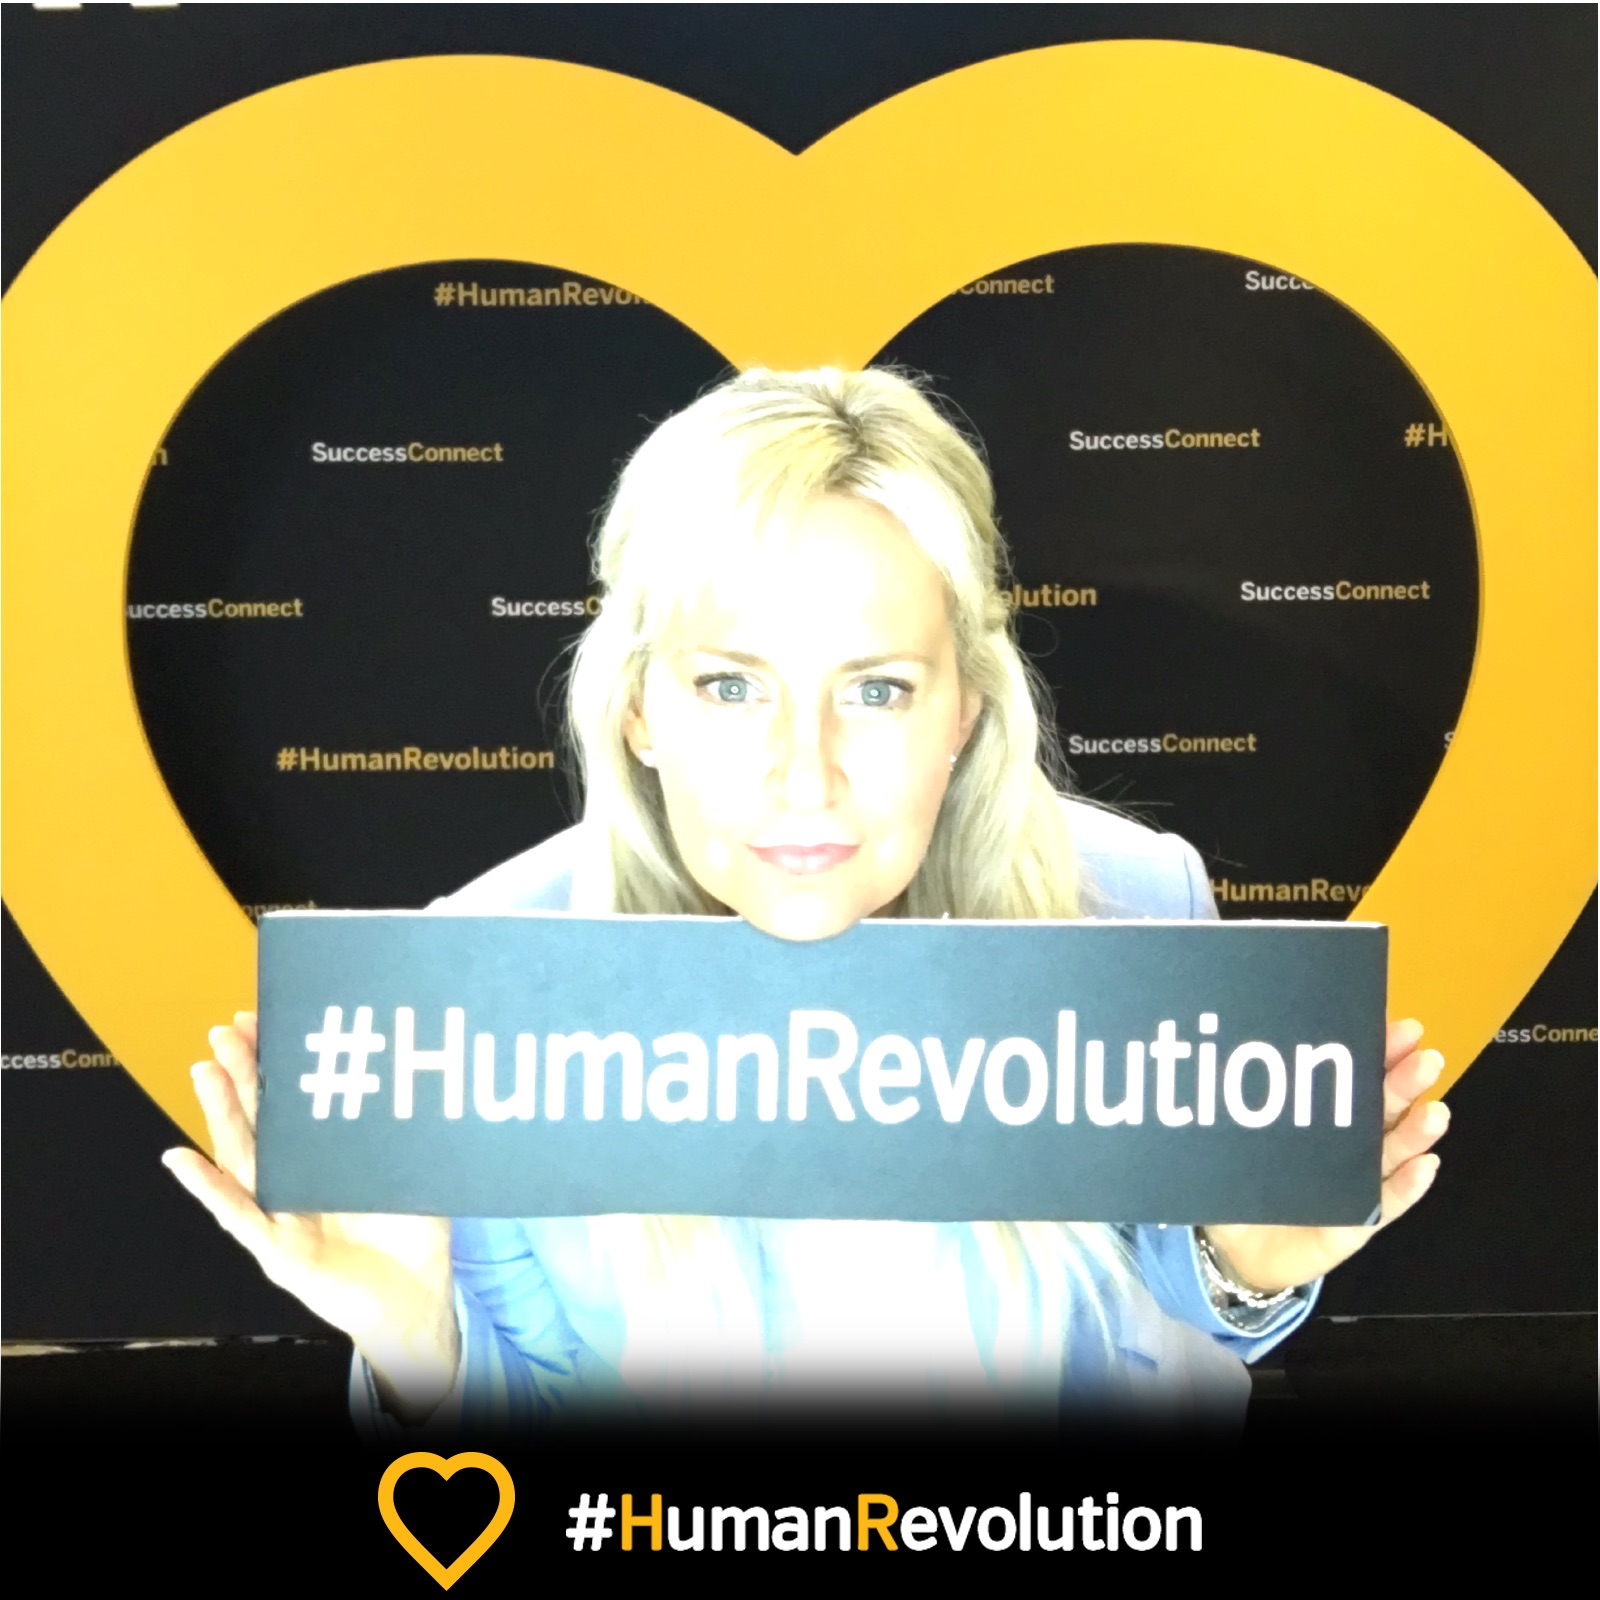 HumanRevolution